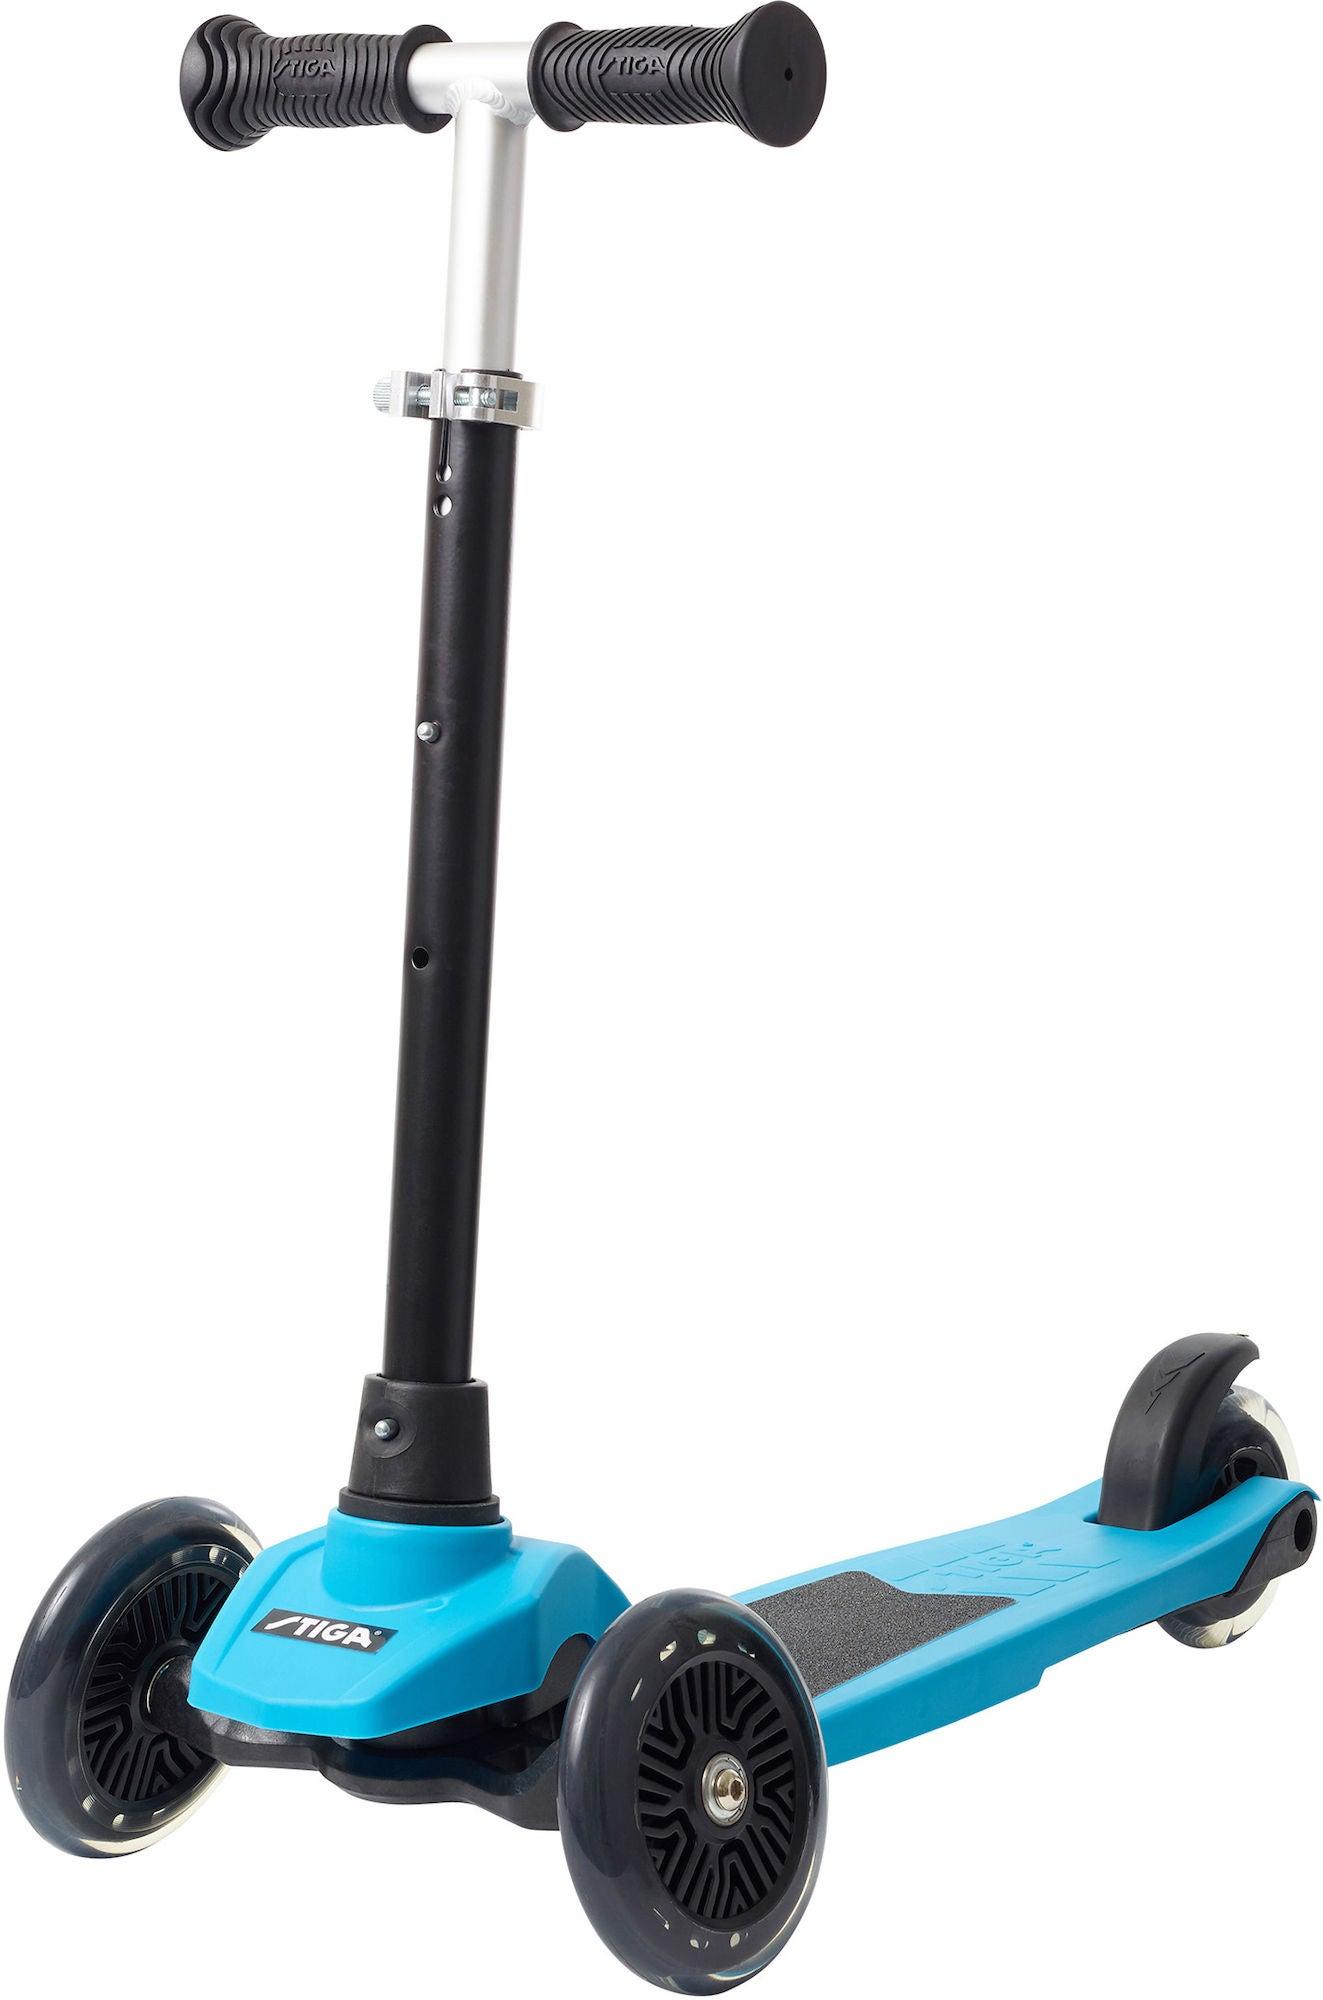 STIGA Sparkcykel Trehjuling Supreme+ 12 tum, Blå